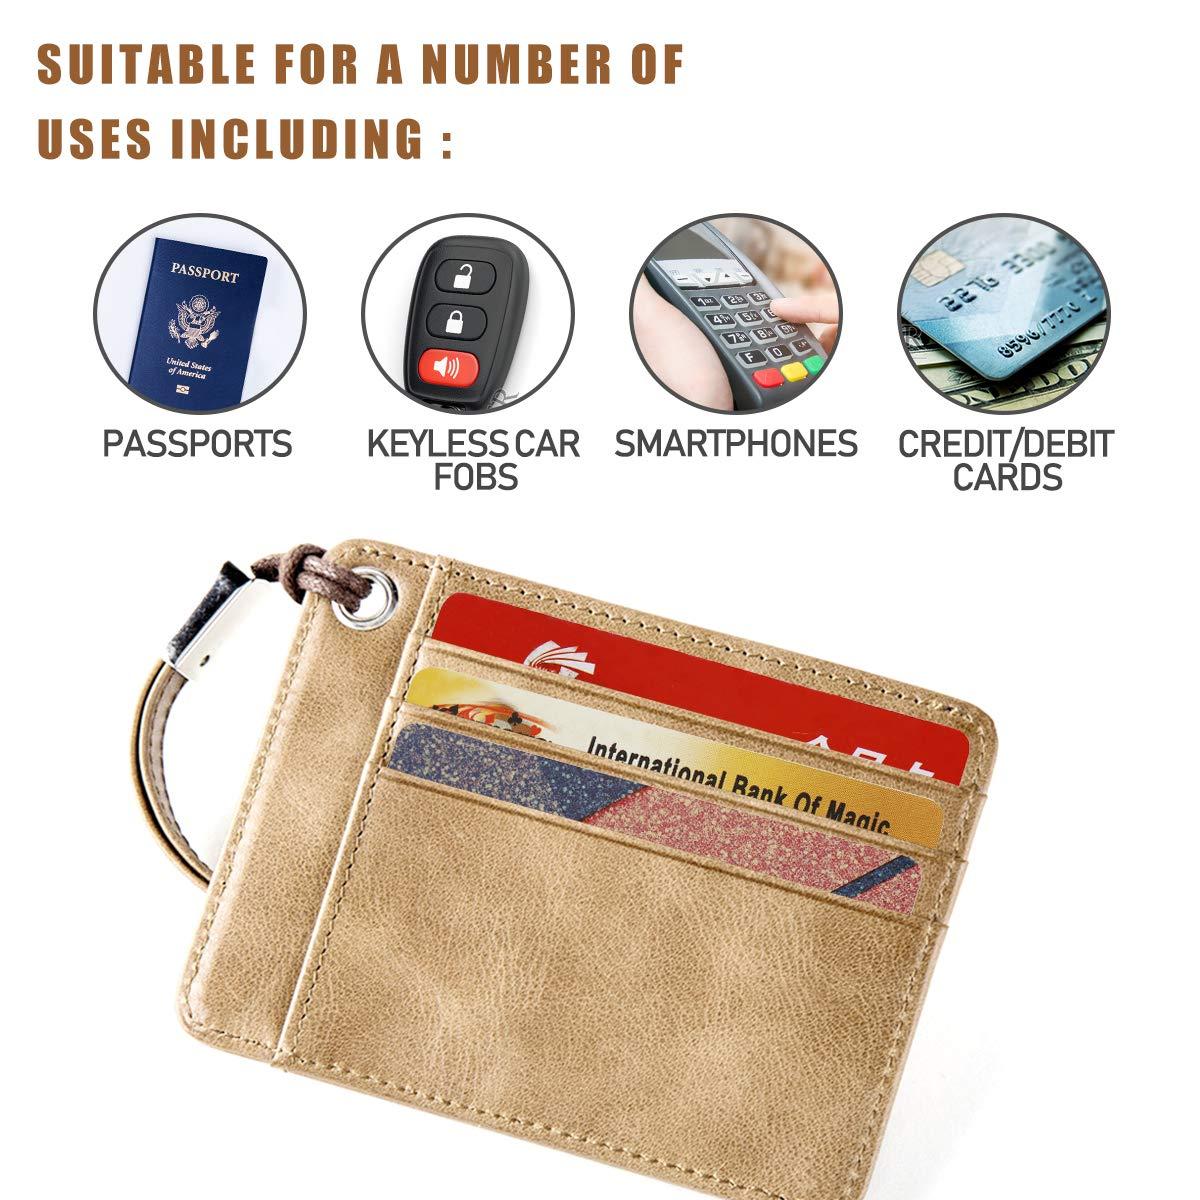 Amazon.com: Tarjeta de bloqueo RFID | Protector de tarjetas ...